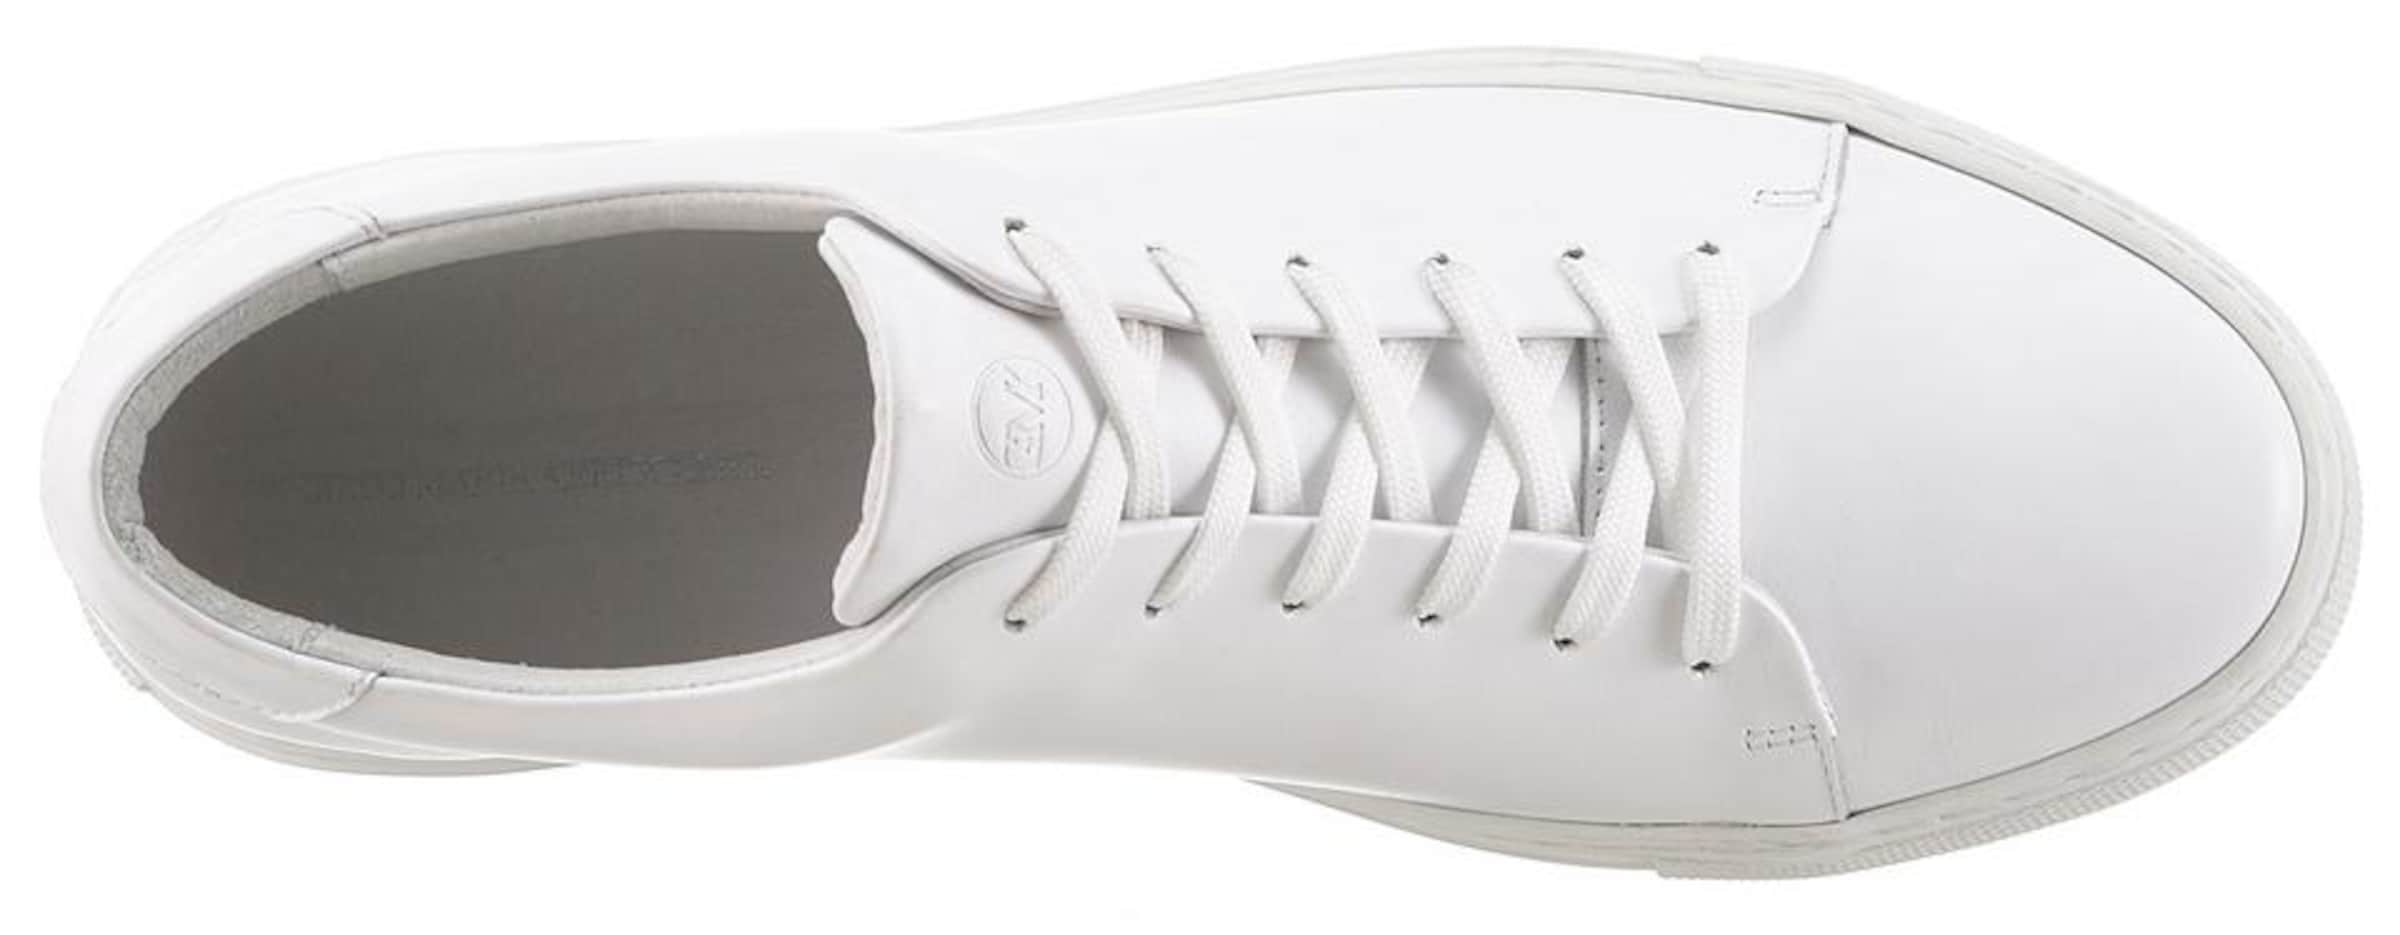 In Guido Maria Kretschmer Weiß Sneaker E9WIbHYeD2